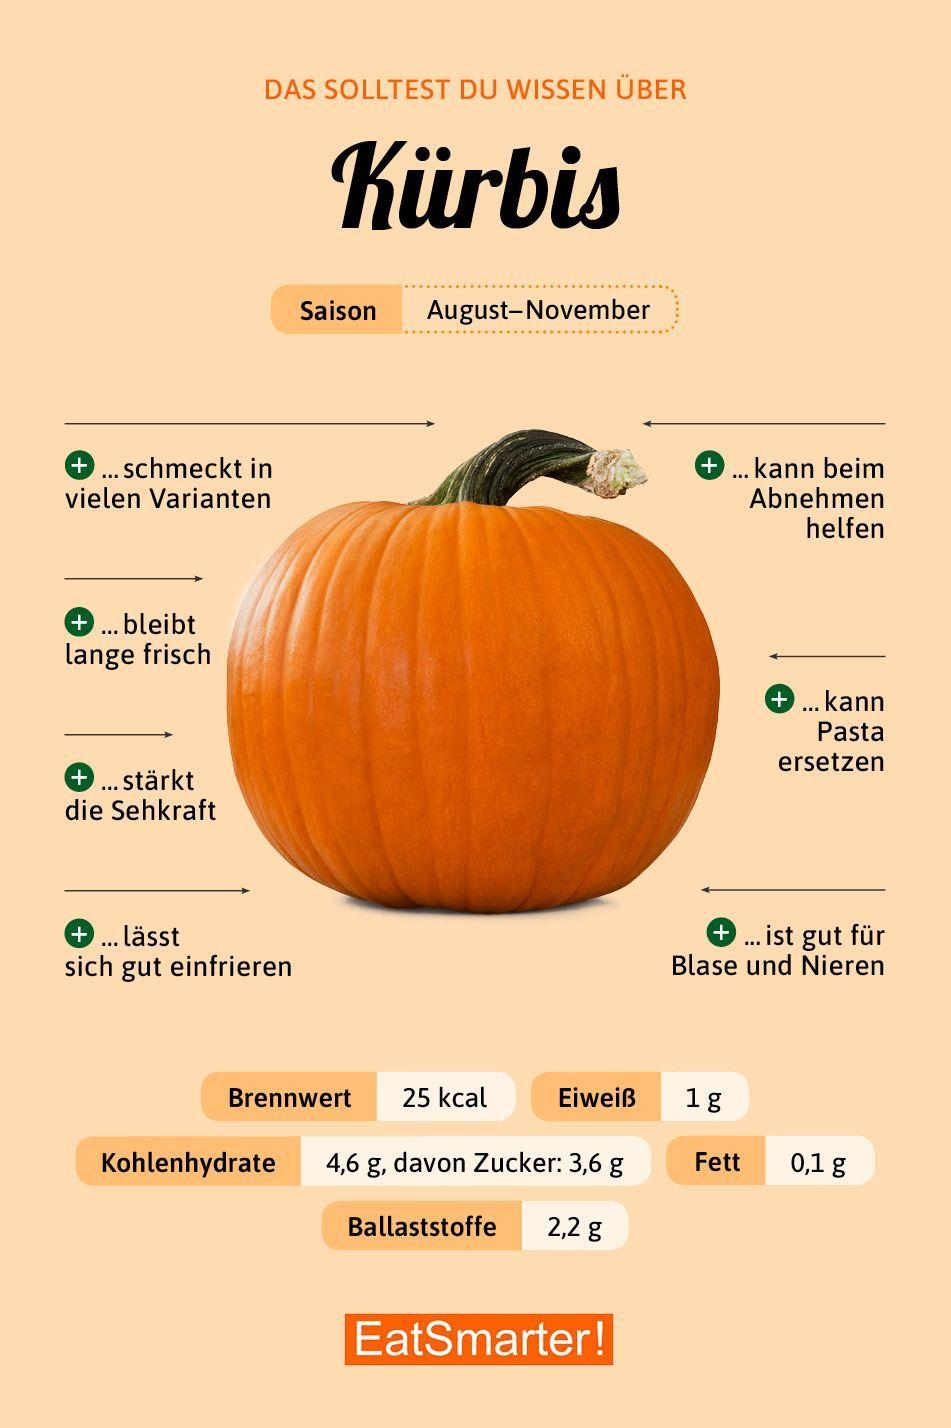 Das Sollte Man Uber Kurbis Wissen Eatsmarter De Kurbis Ernahrung Infografik In 2020 Healthy Nutrition Pumpkin Nutrition Nutrition Tips